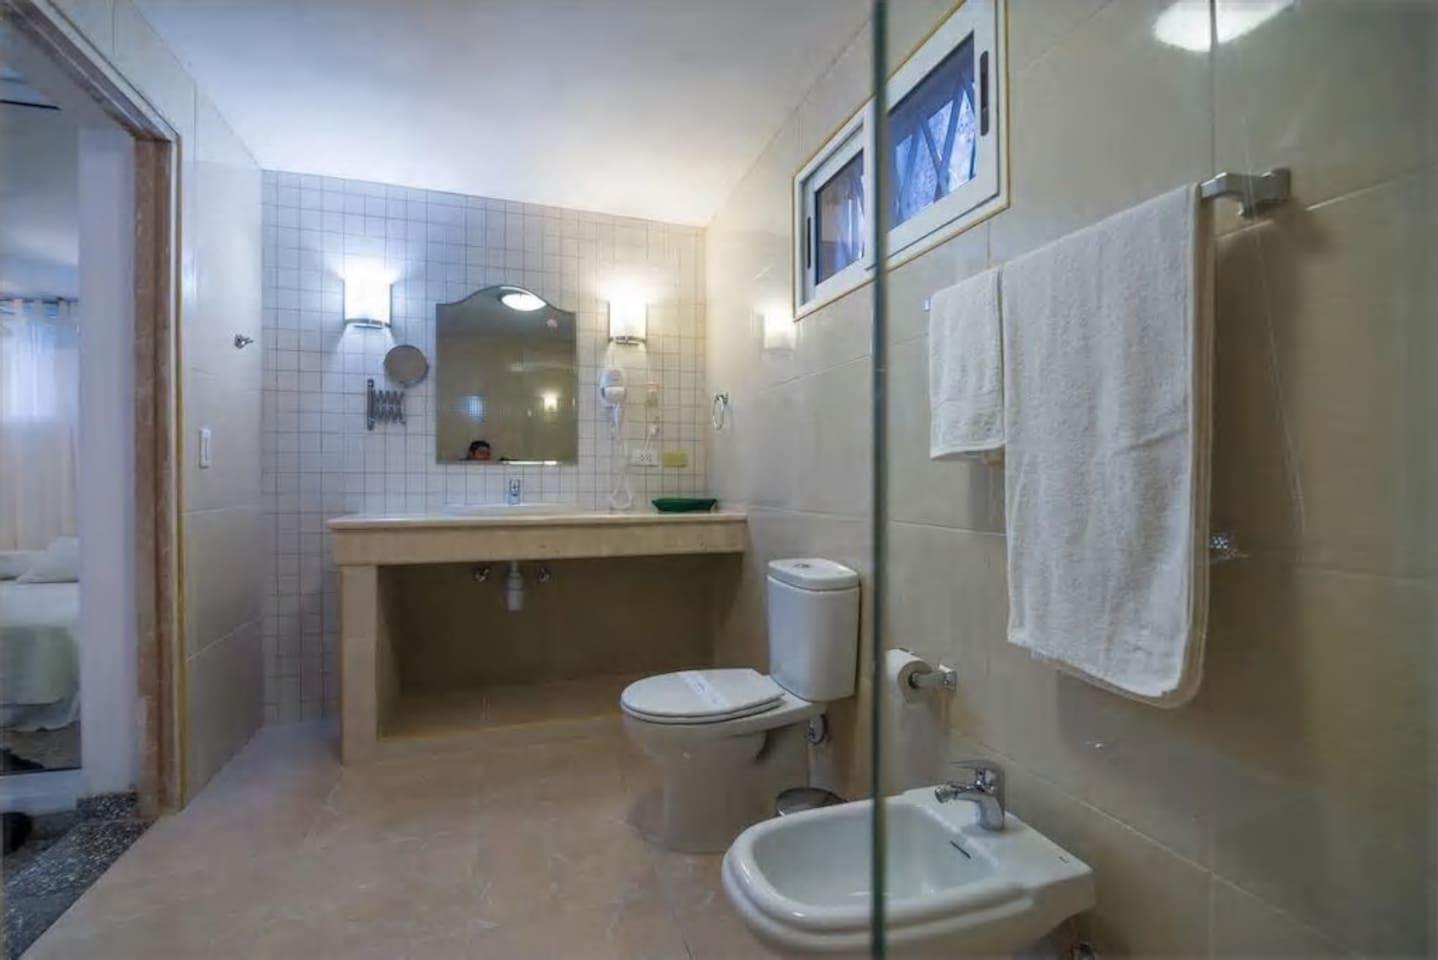 Apartment Villa Don Teto Suite   8 Rooms  Great Havana View photo 17034790